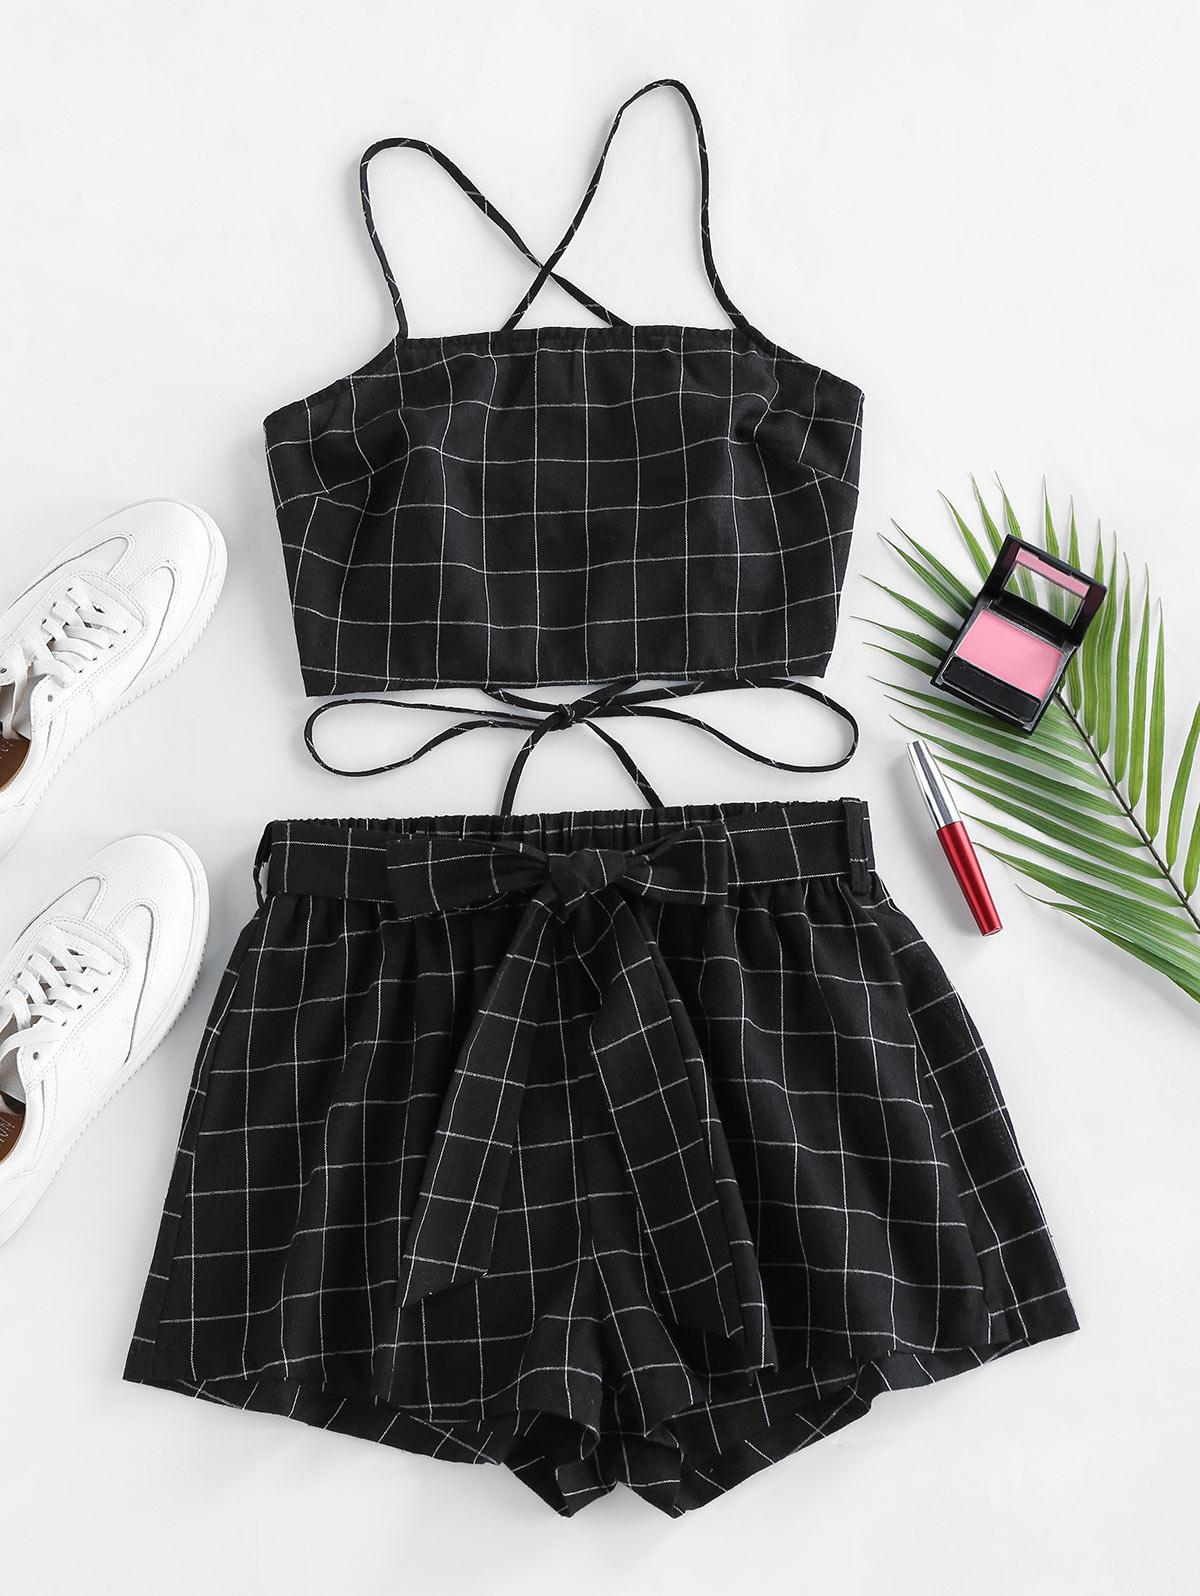 ZAFUL Grid Lace Up Belted Shorts Set